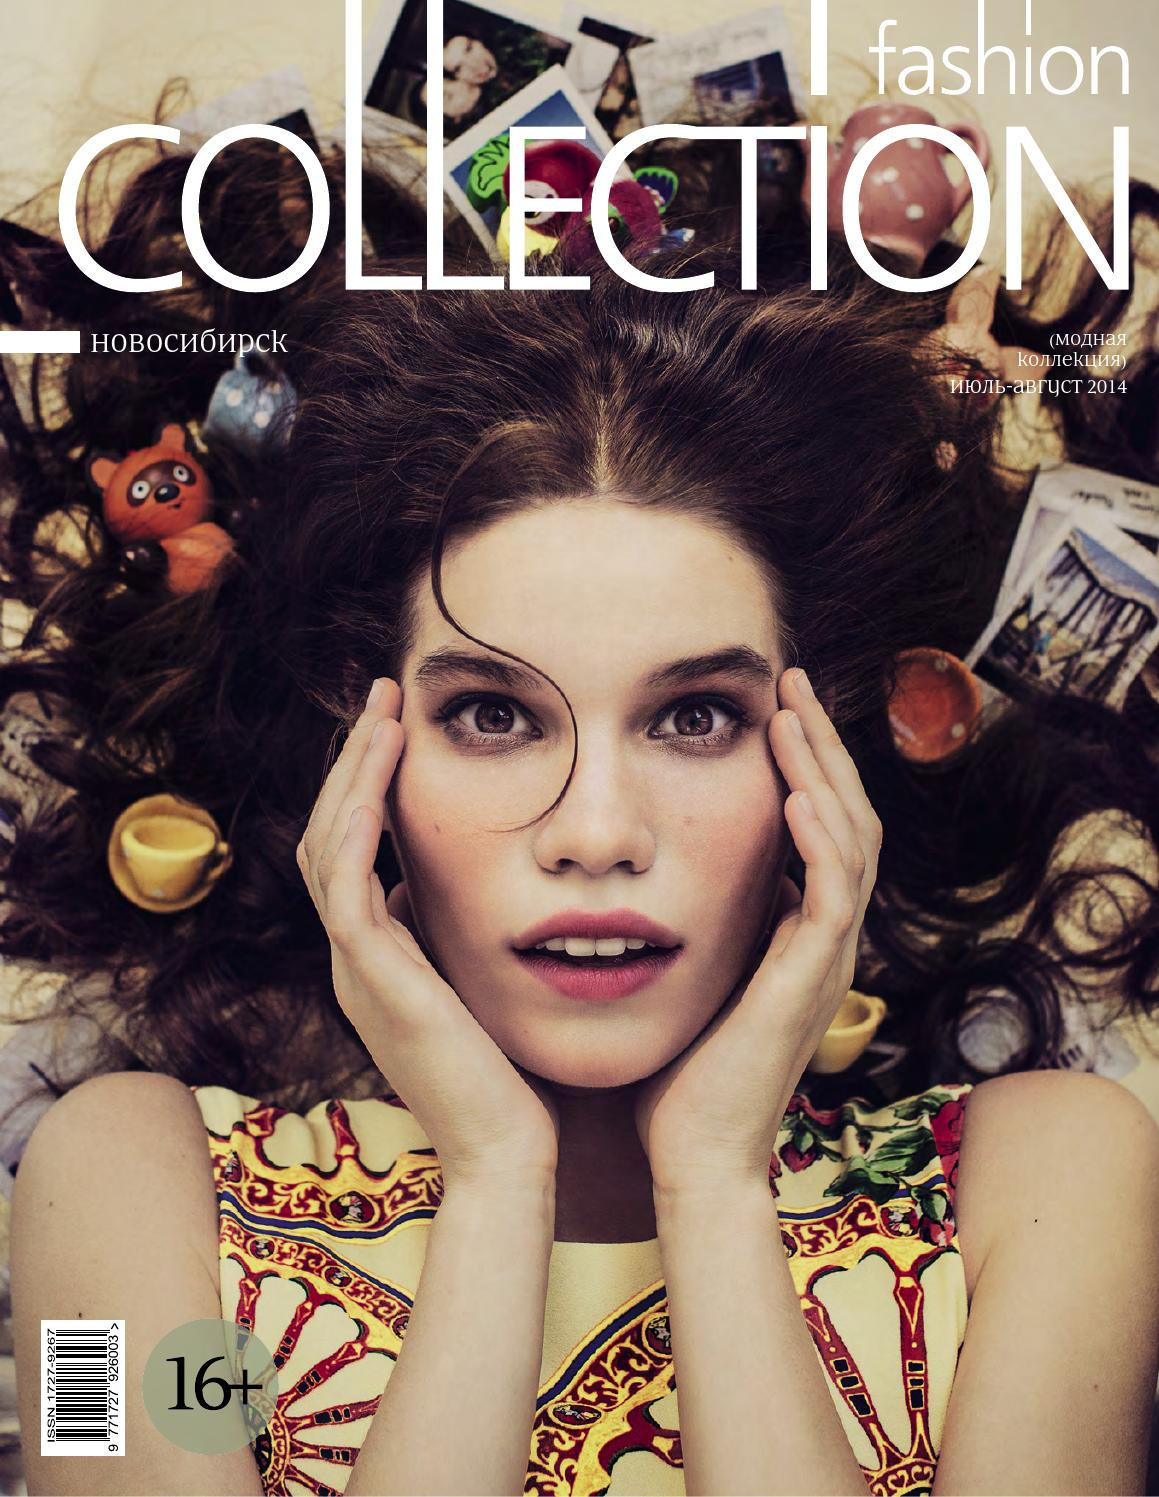 Fashion Collection July-August 2014 by Ksenya Kamanova - issuu d66b41eb864